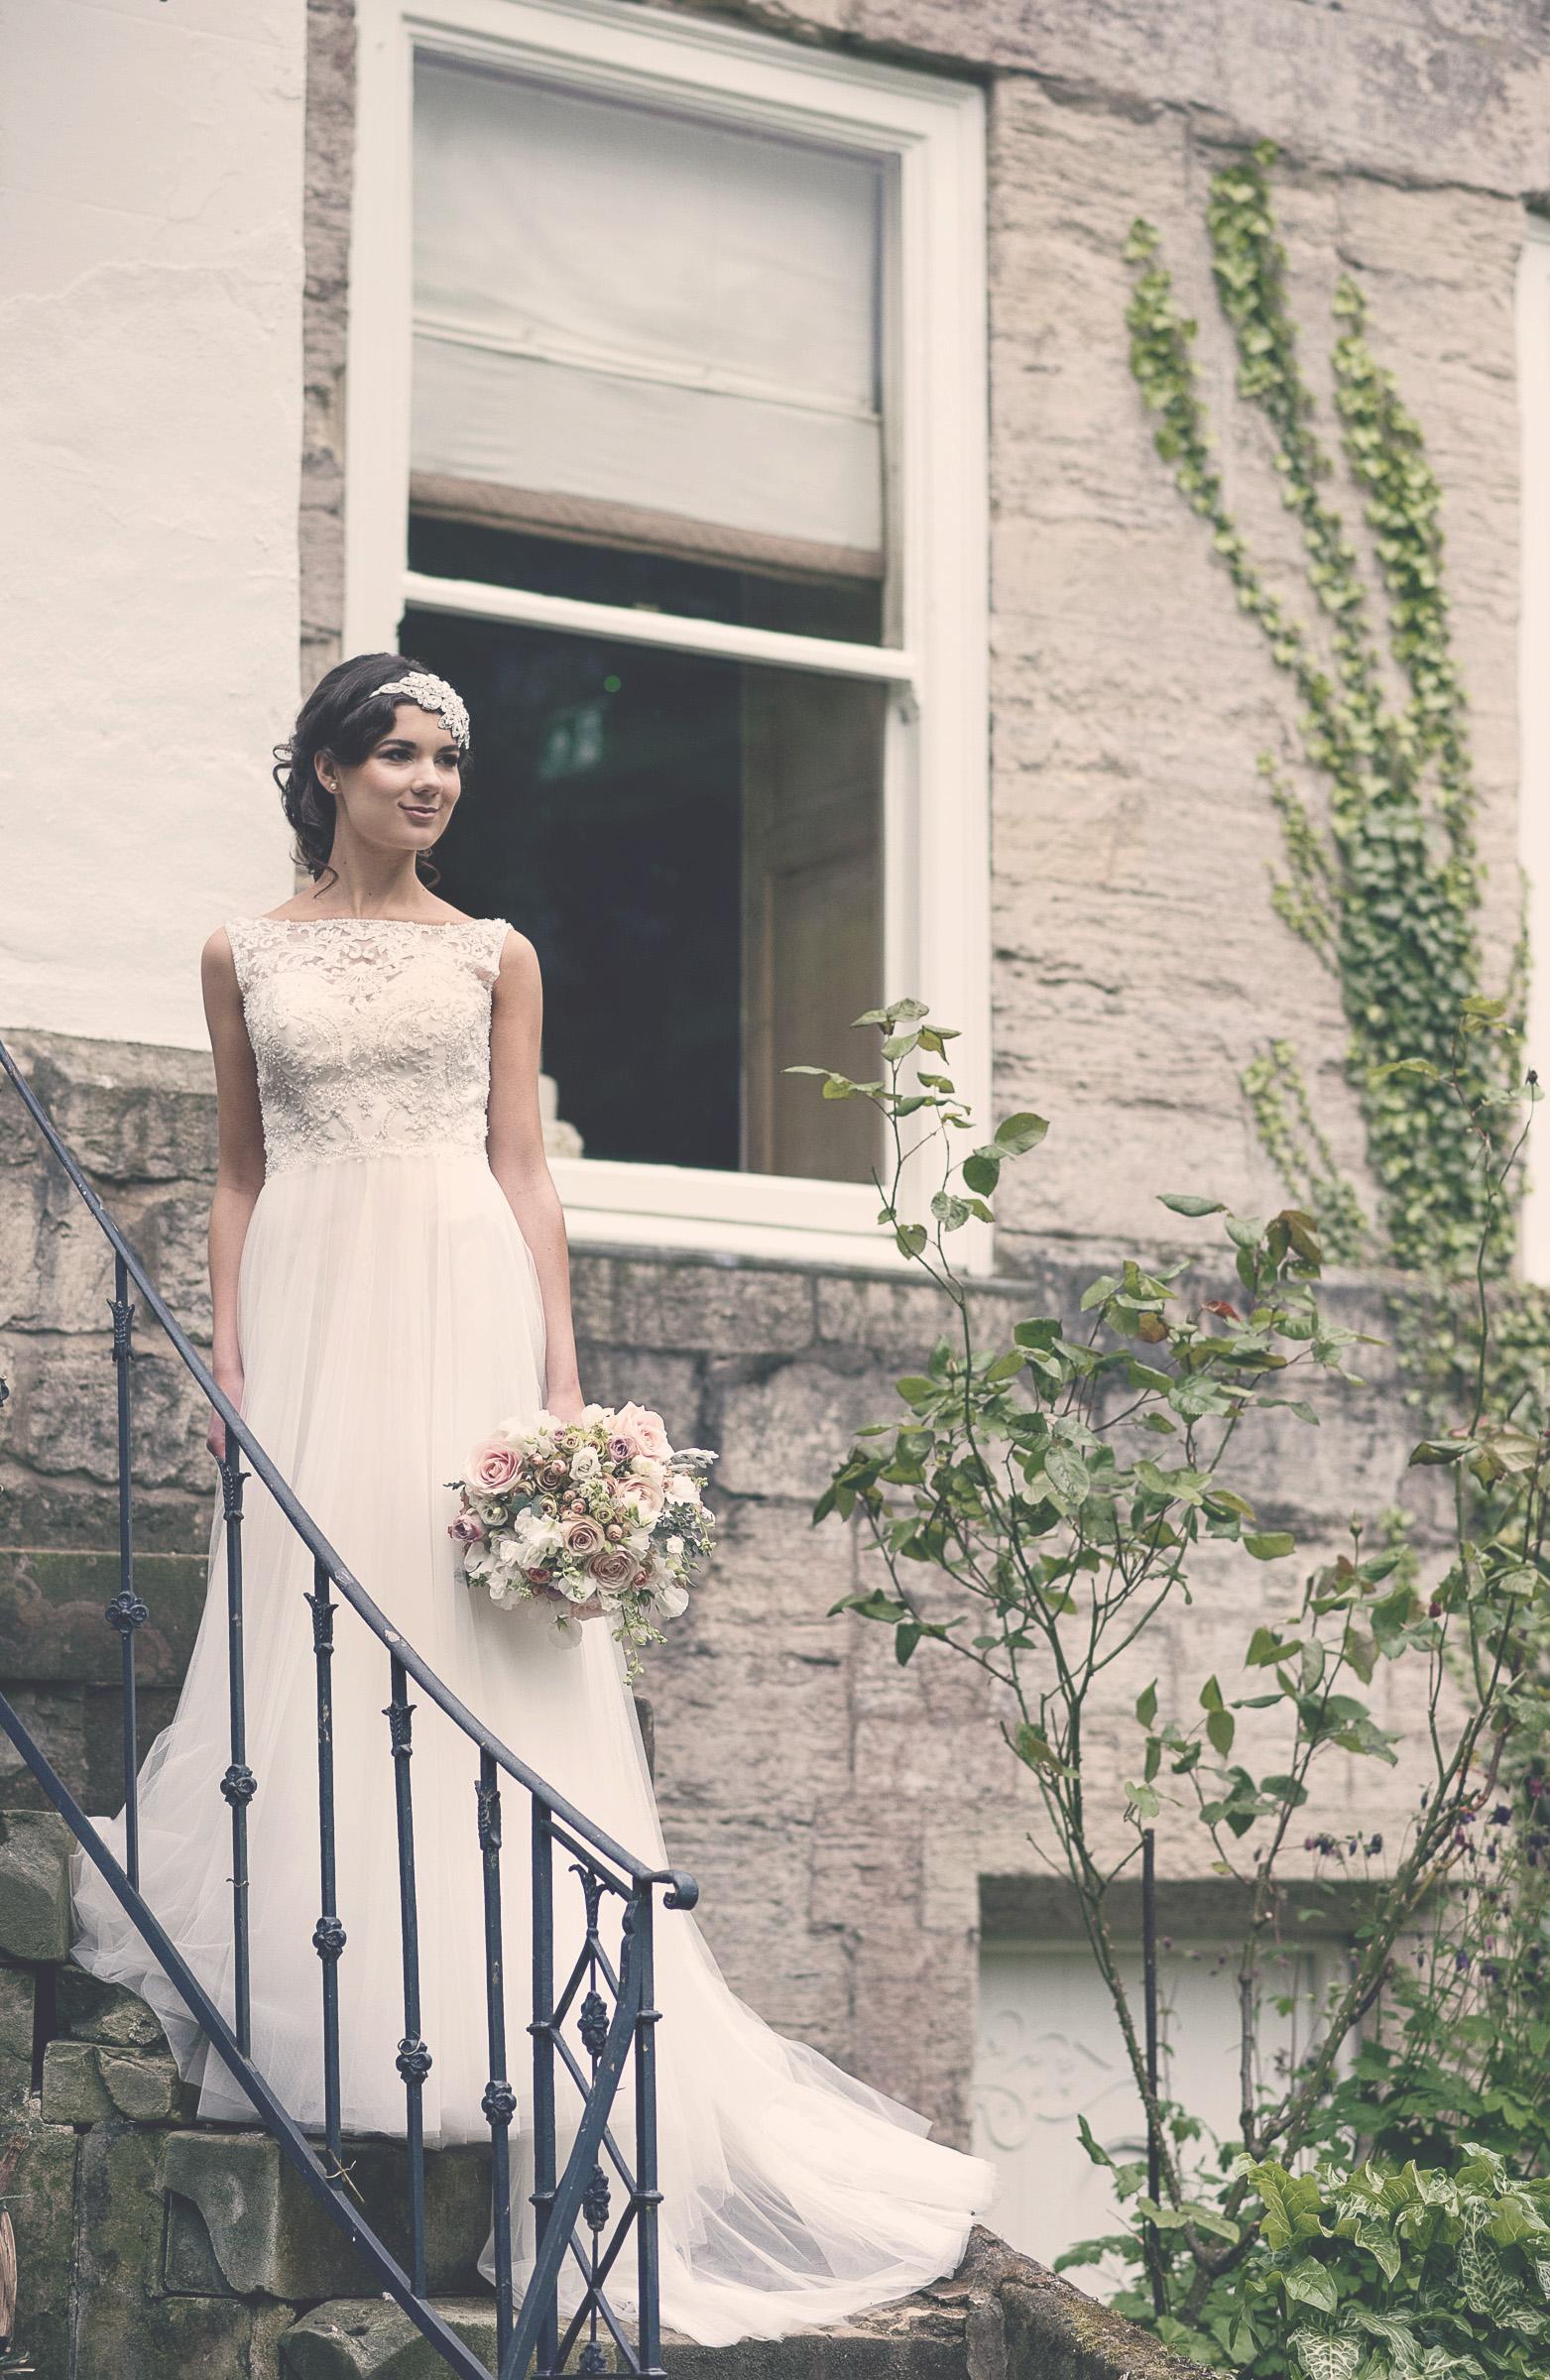 Shine-Model-Leeds-Harrogate-bridal-Suzannah-01.jpg#asset:44792